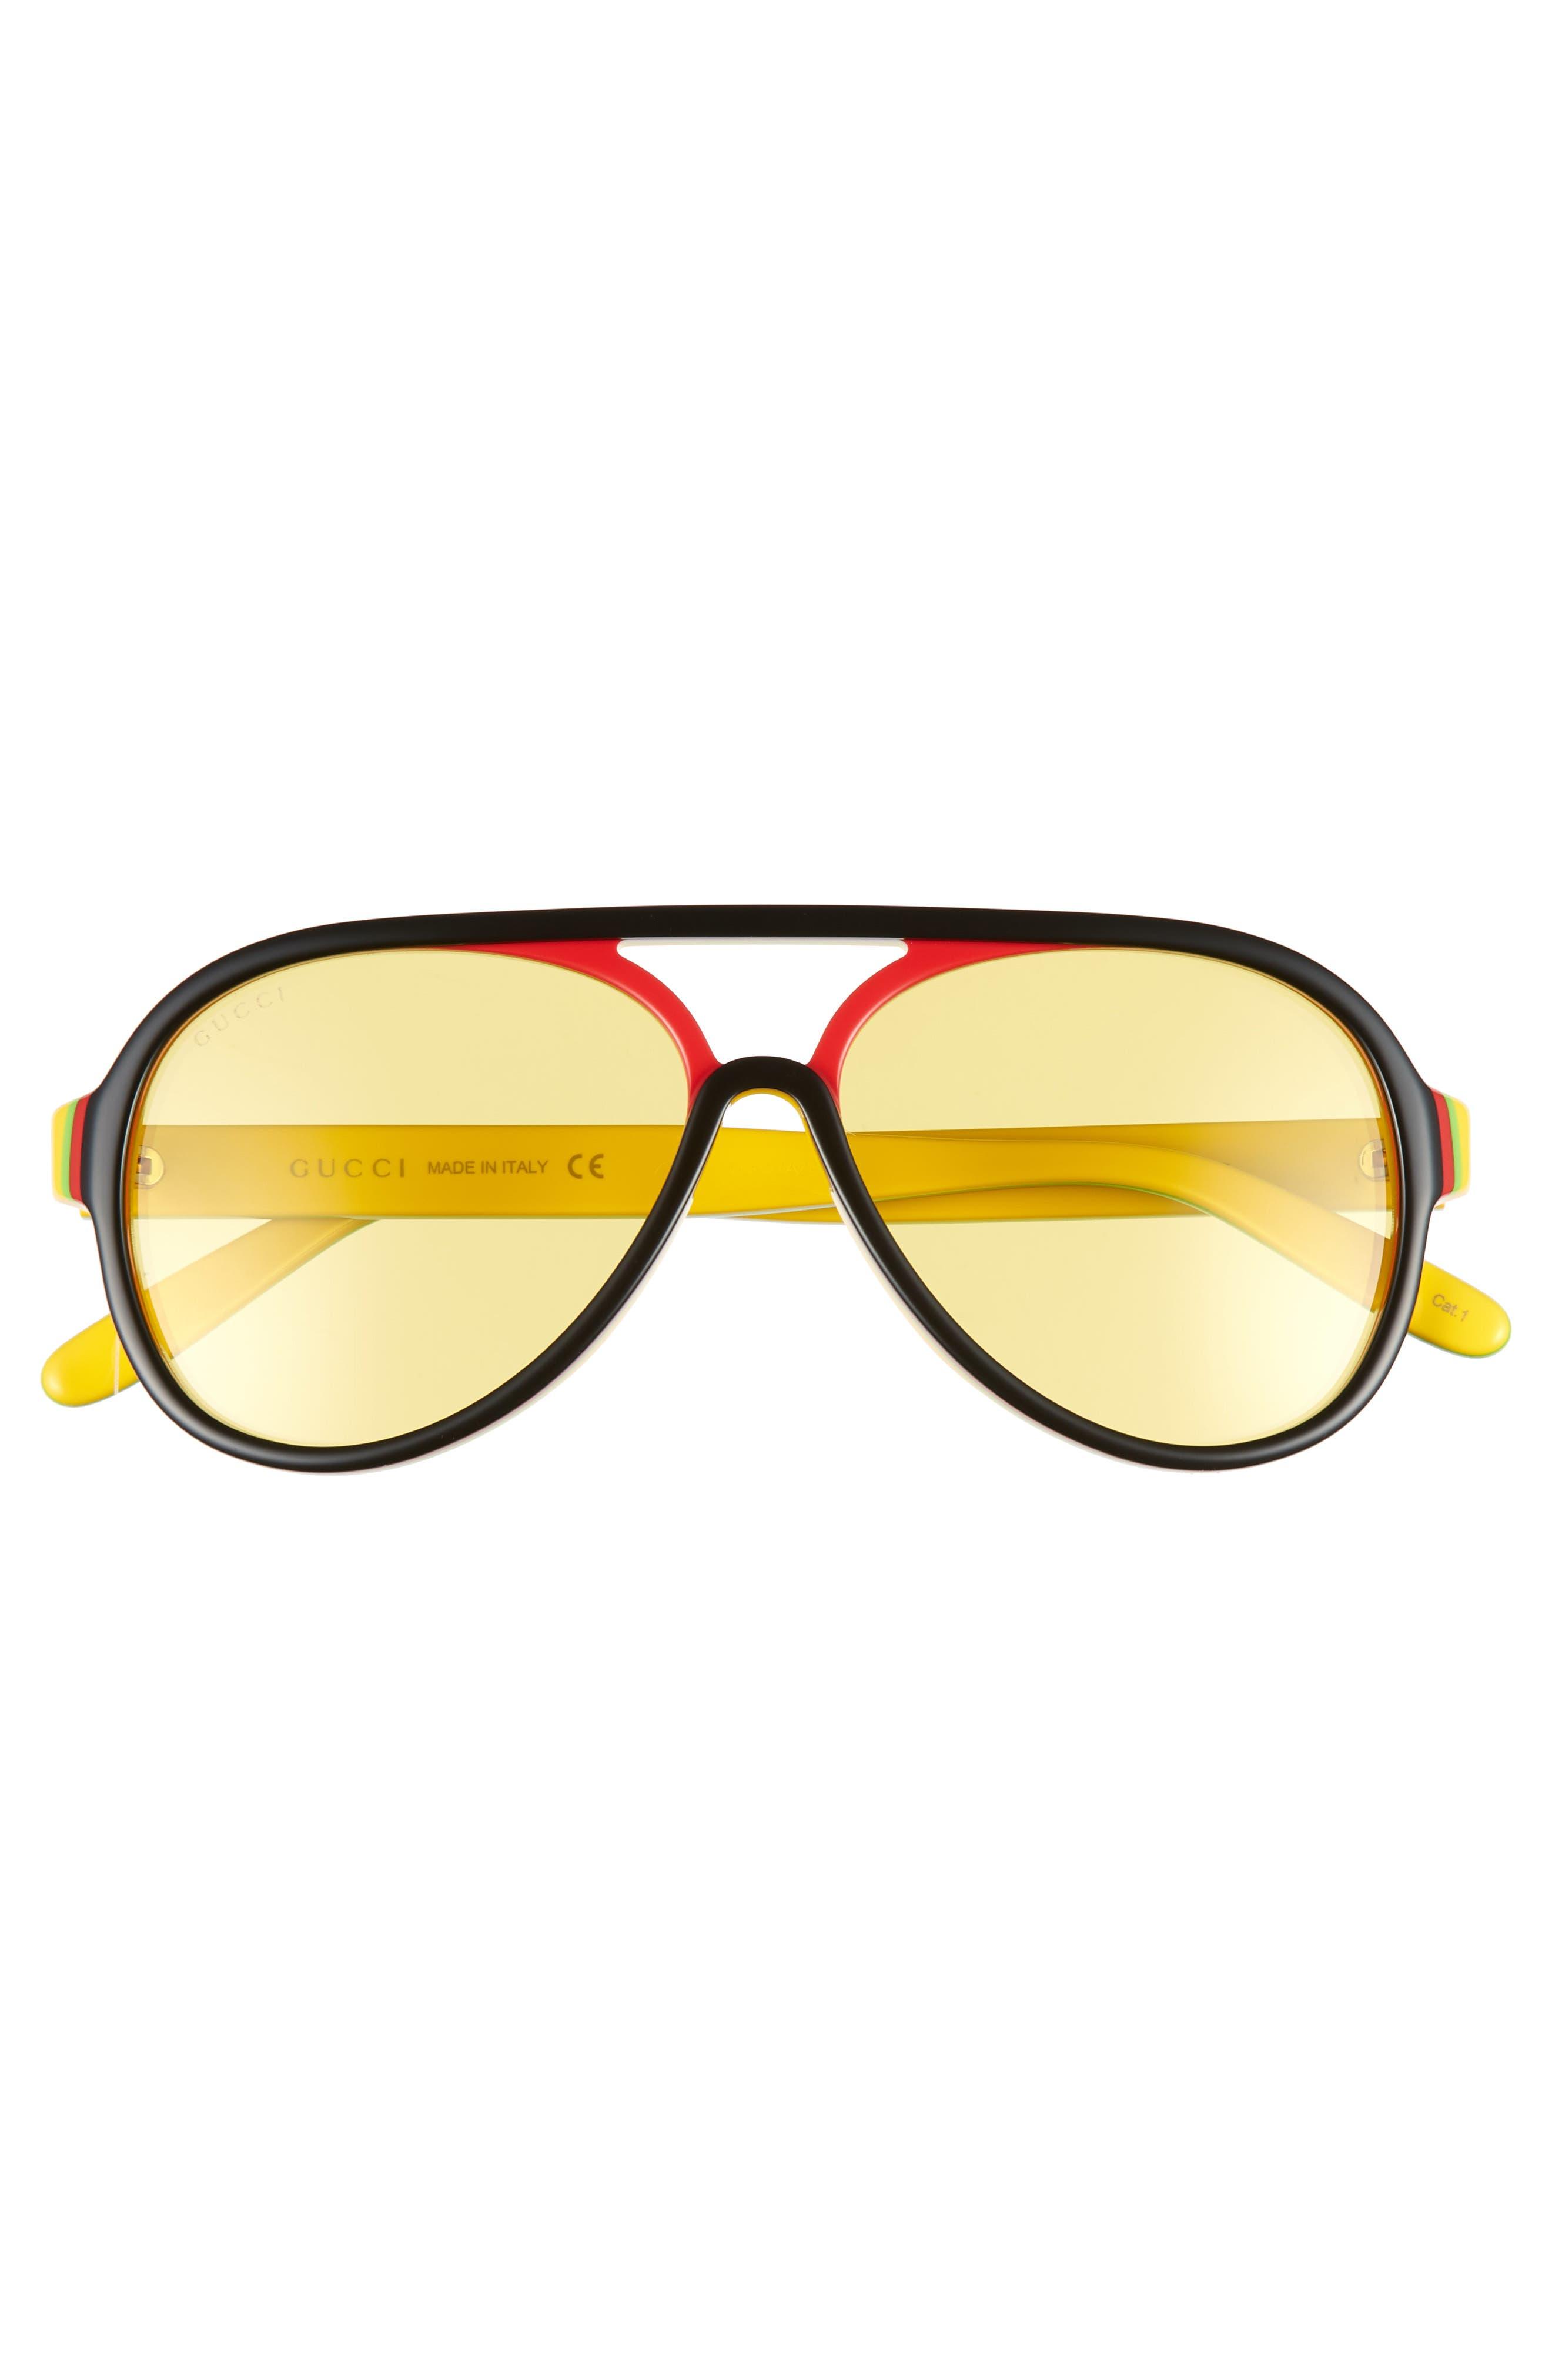 GUCCI,                             57mm Aviator Sunglasses,                             Alternate thumbnail 2, color,                             005